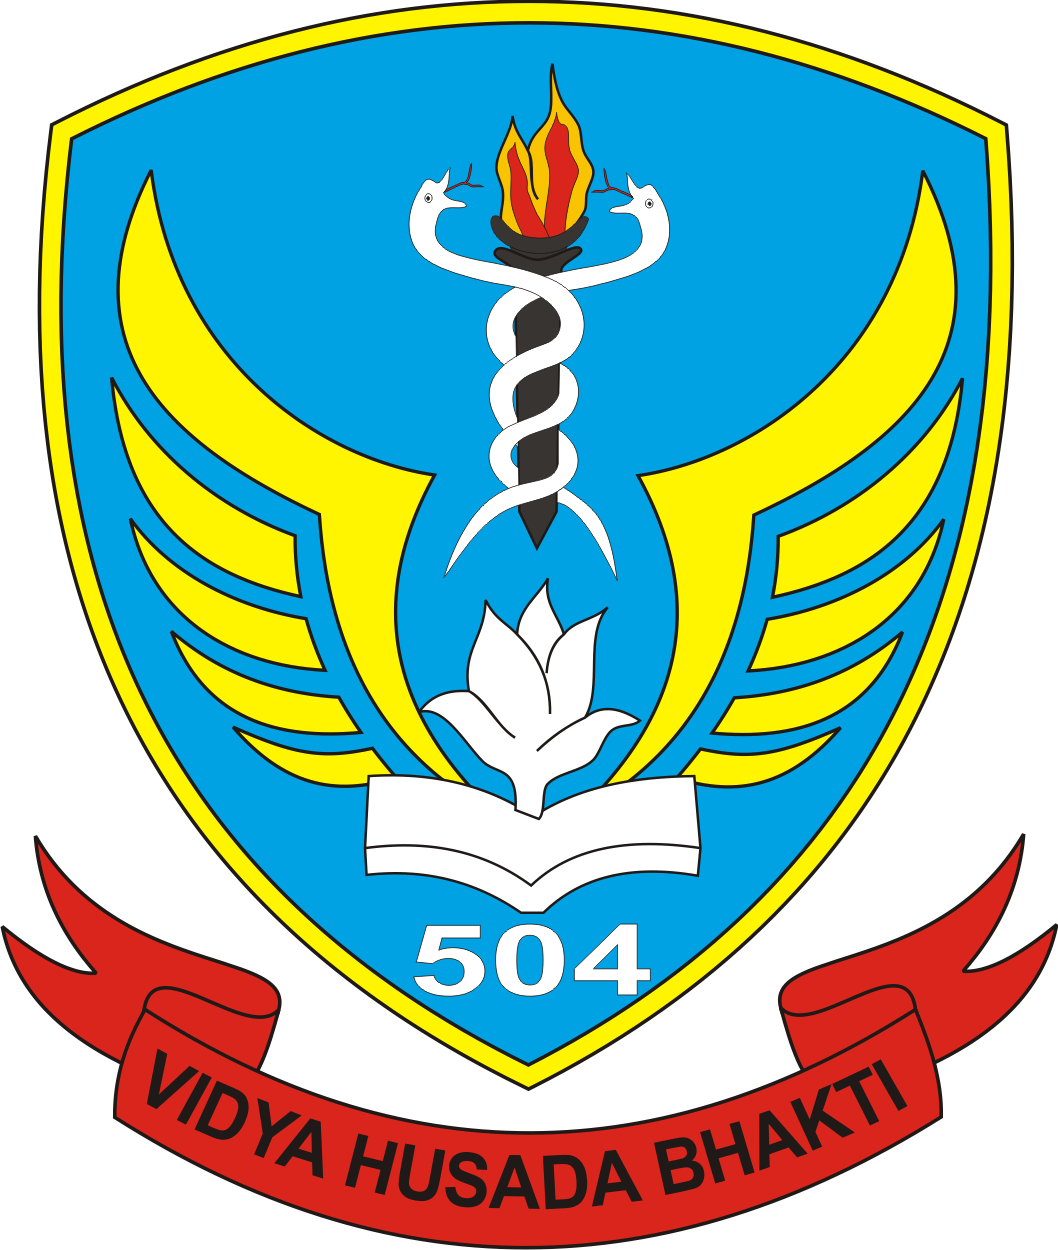 logo skadron pendidikan skadik 504 wing pendidikan